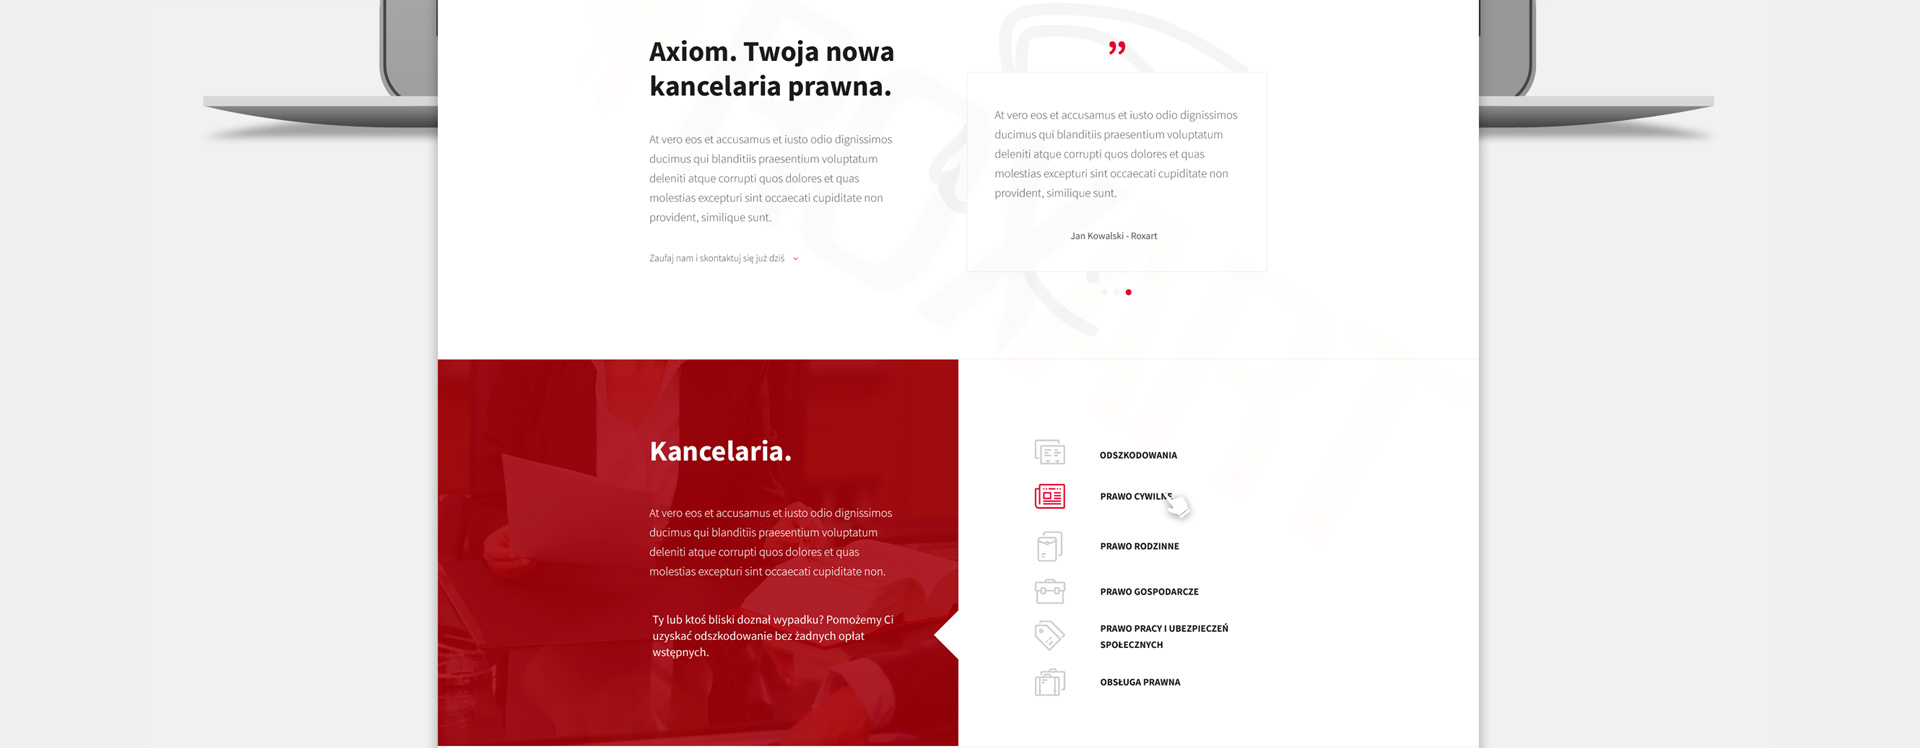 Axiom - Realizacja - Agencja ROXART